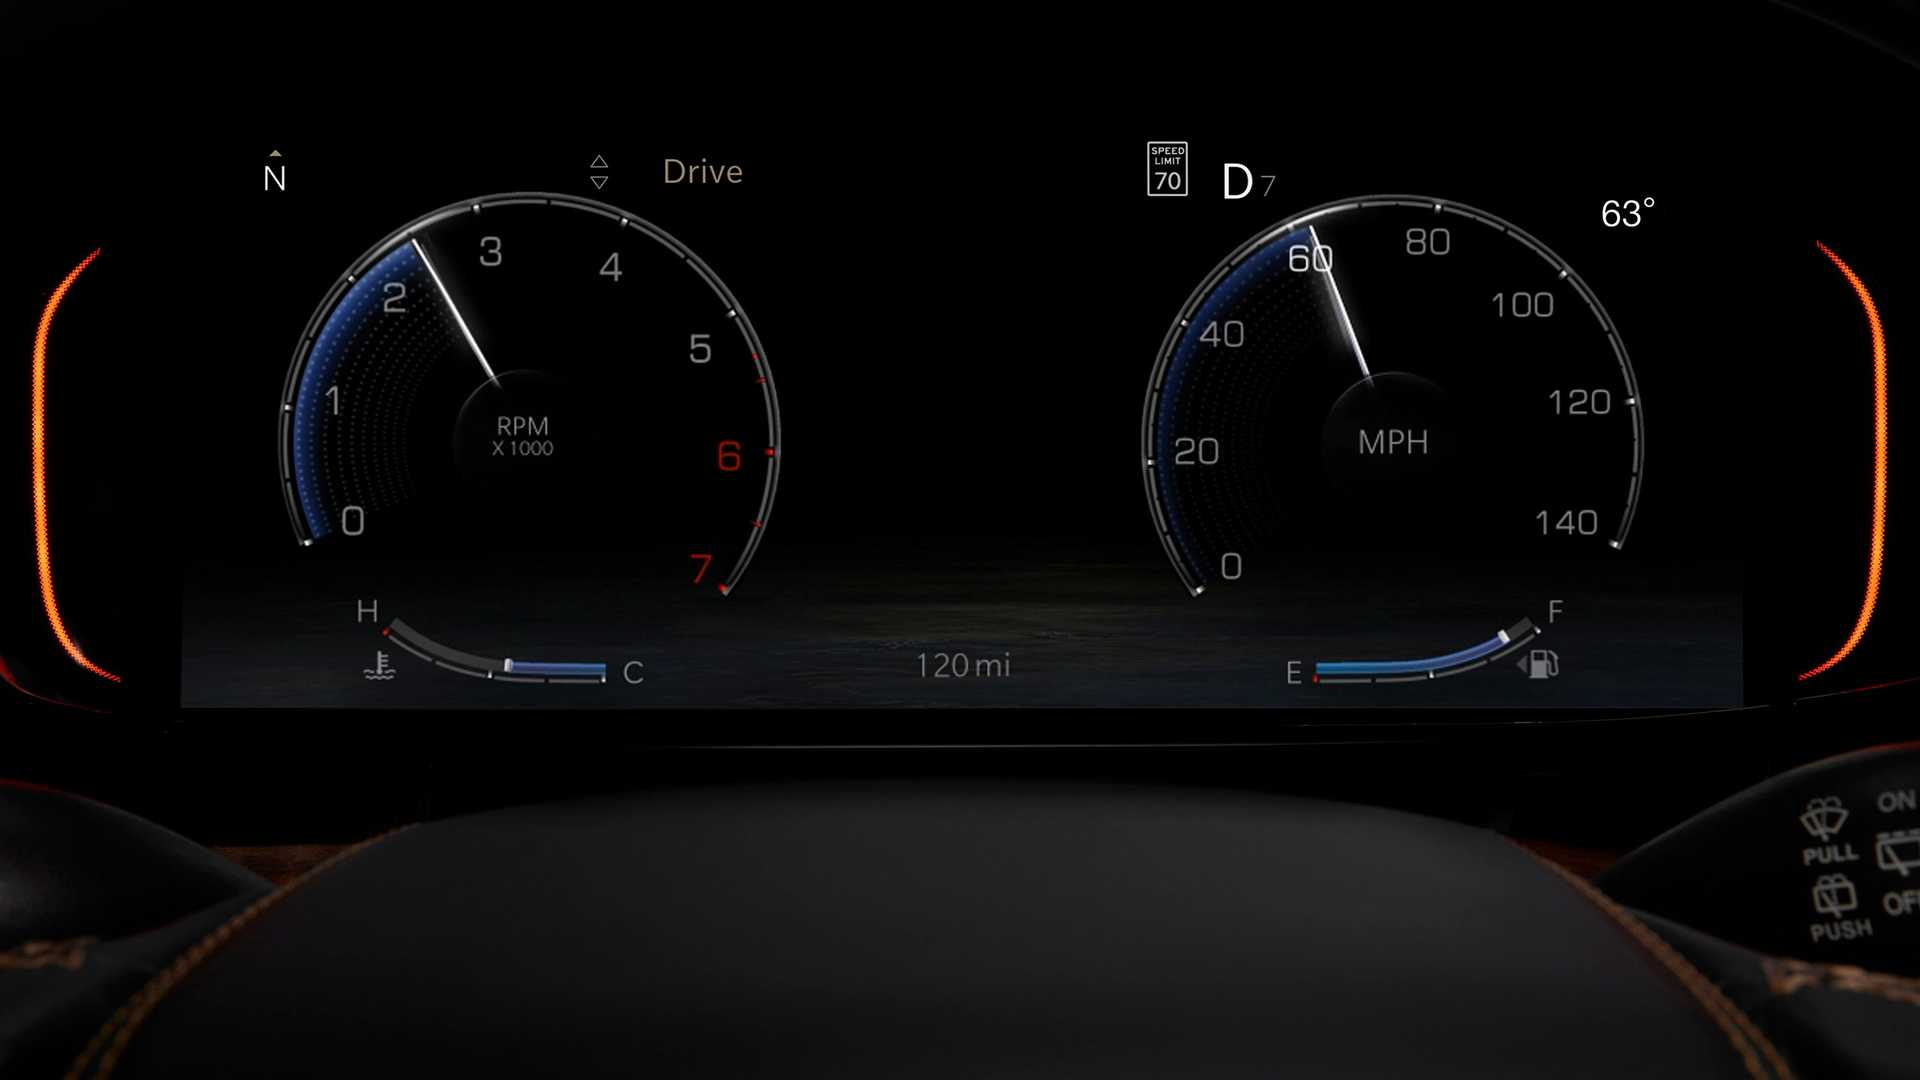 2022-jeep-wagoneer-interior-digital-instrument-cluster-2